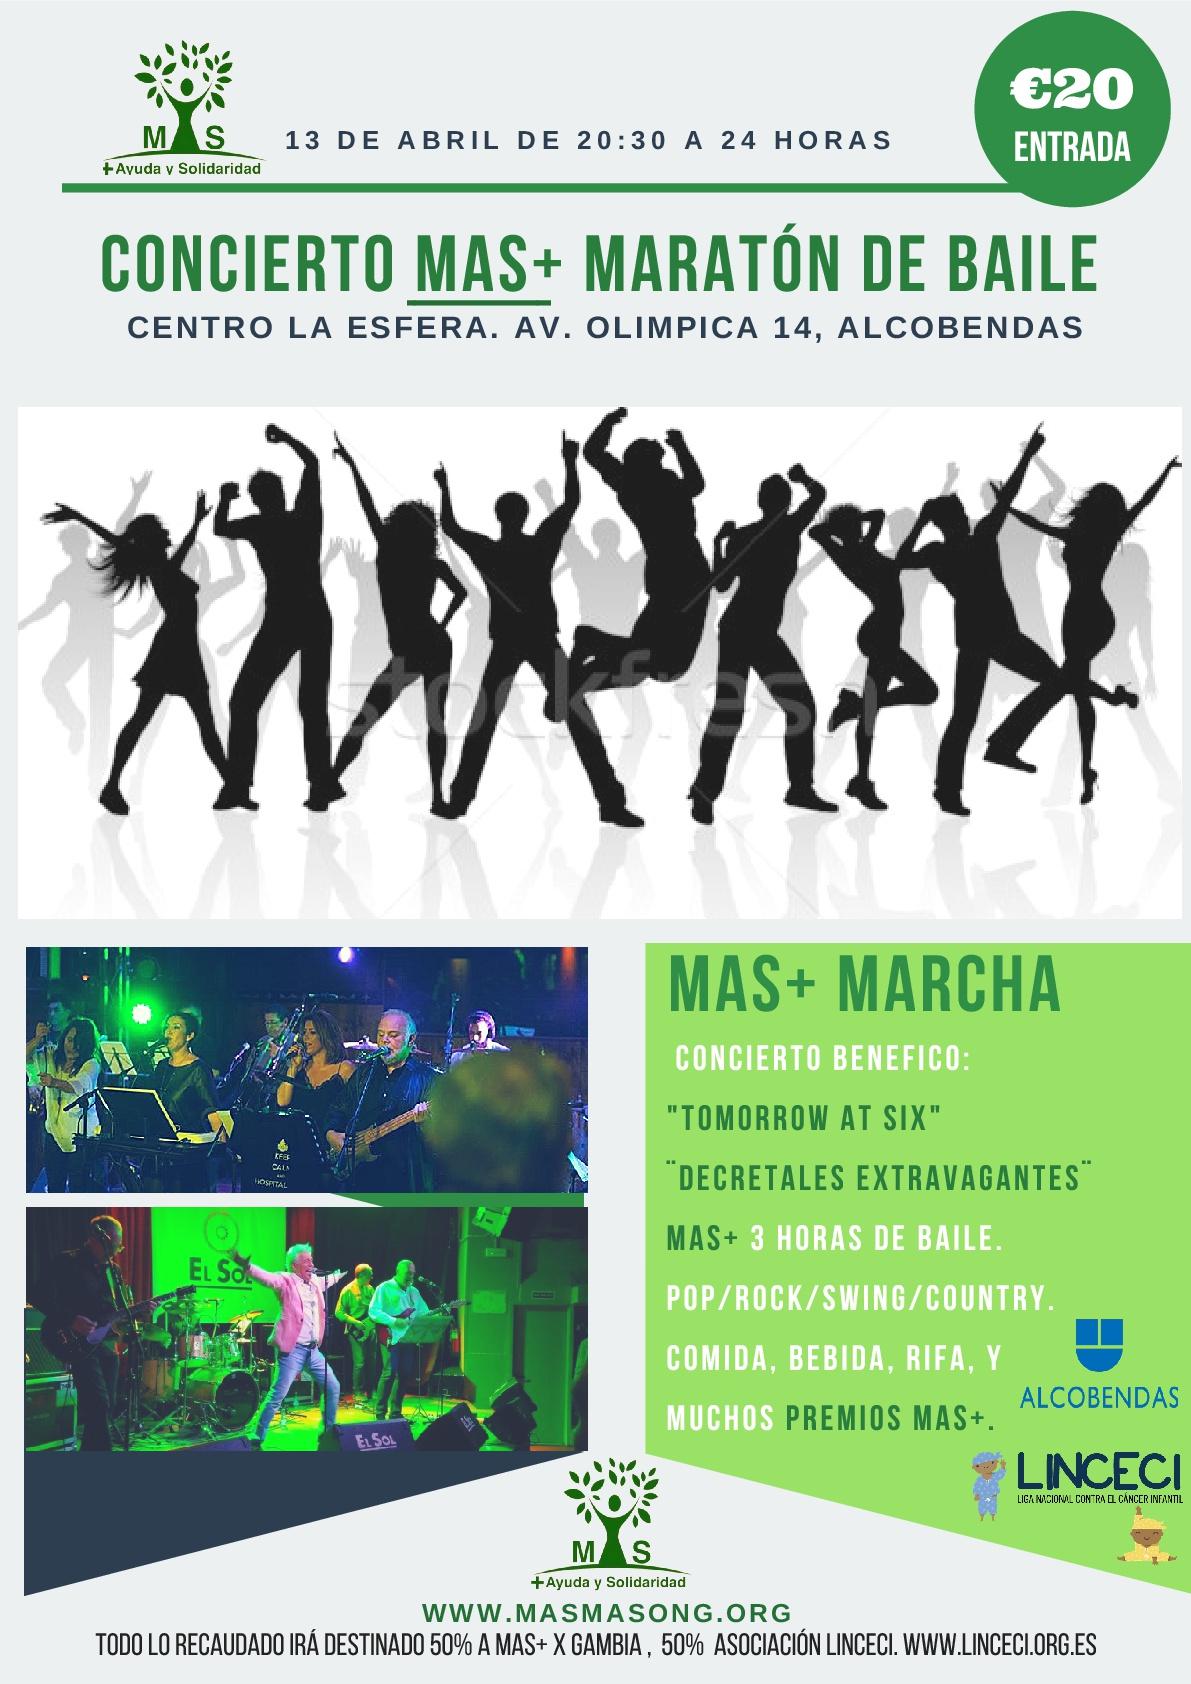 MAS+ MARCHA 2018